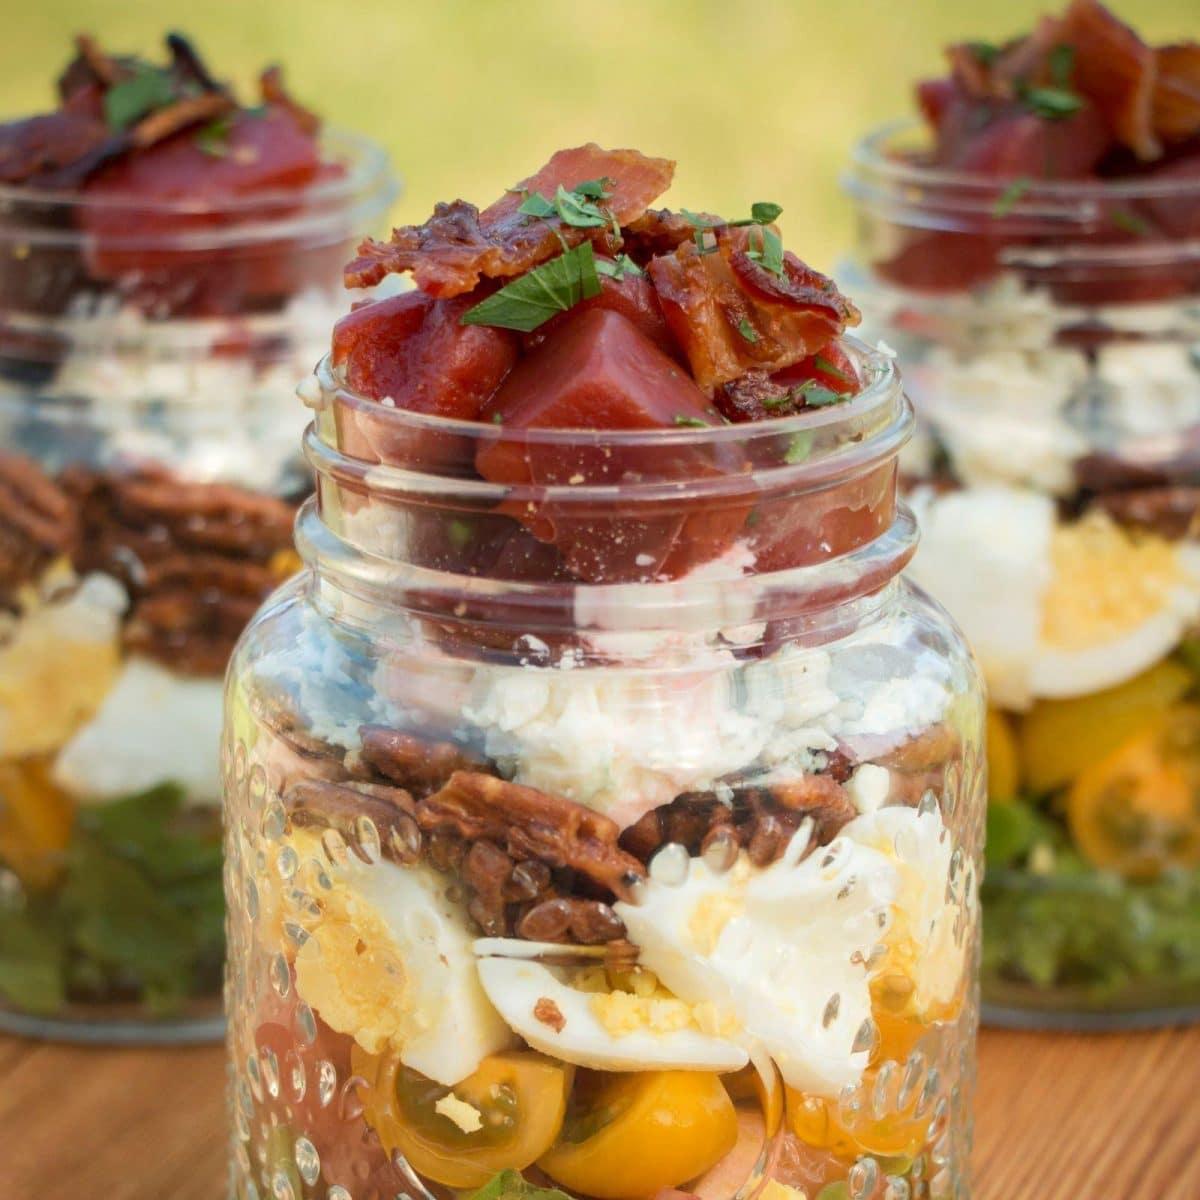 layered-sweet-beet-salad-in-a-jar